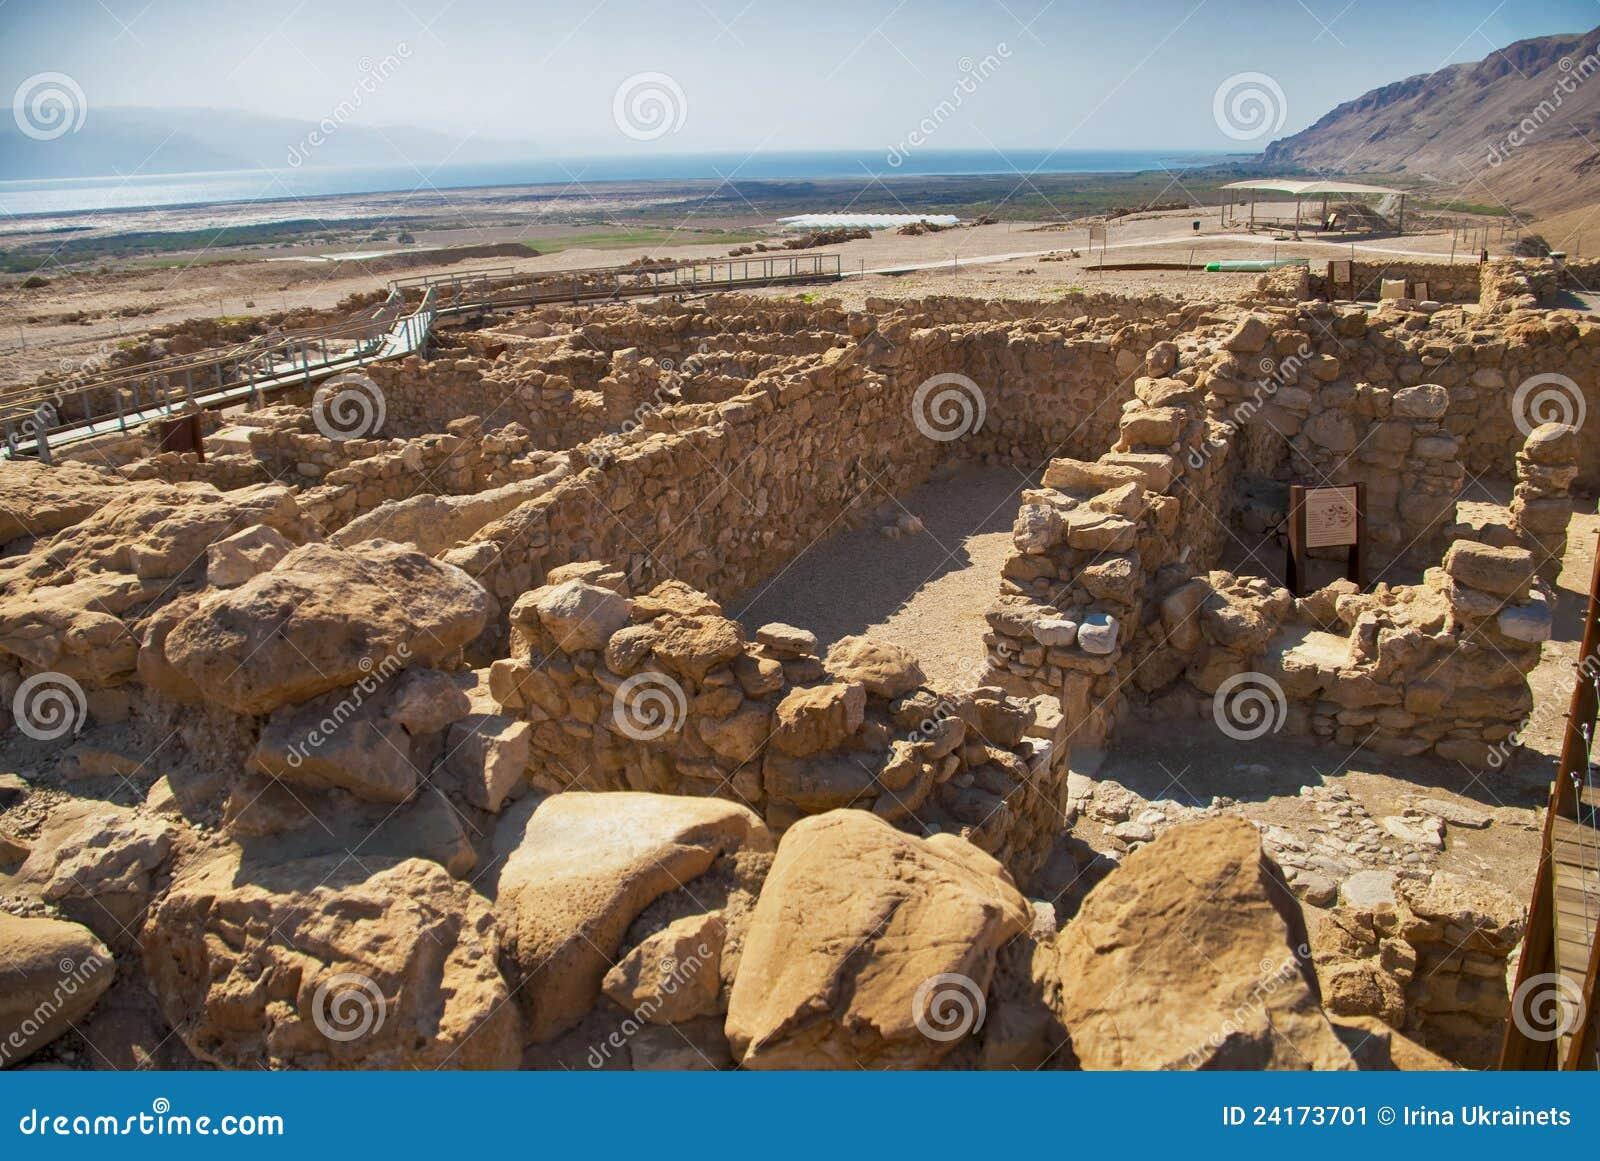 Archeological site, Qumran, Israel.